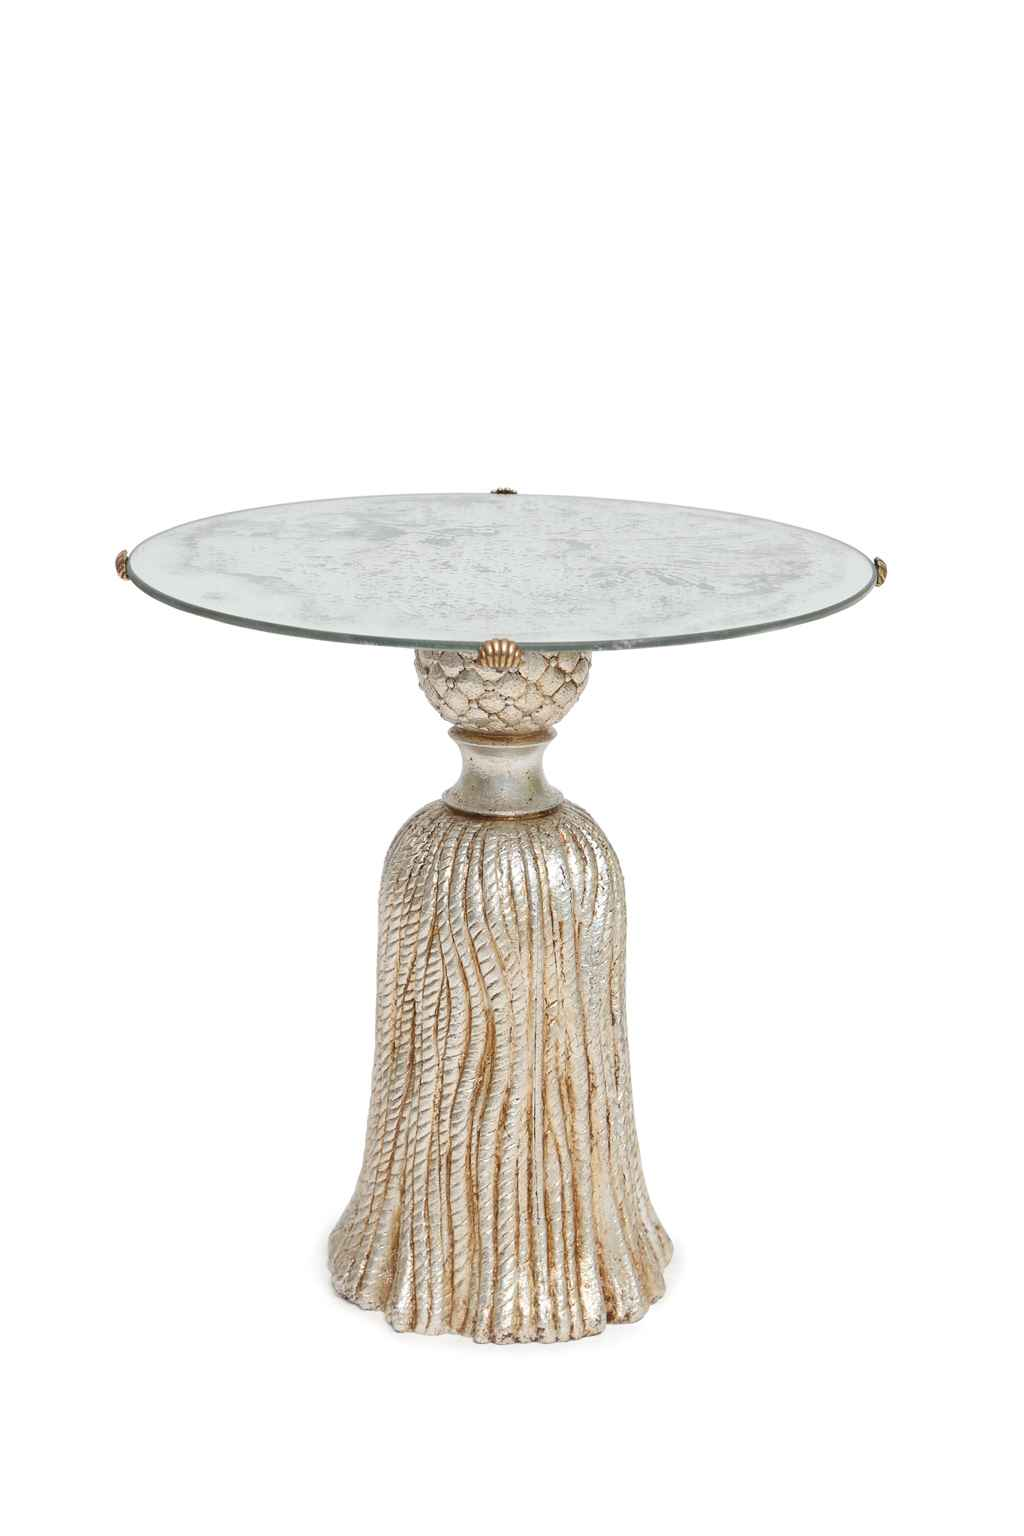 Tassel Accent Table w... by  Italian  - Masterpiece Online